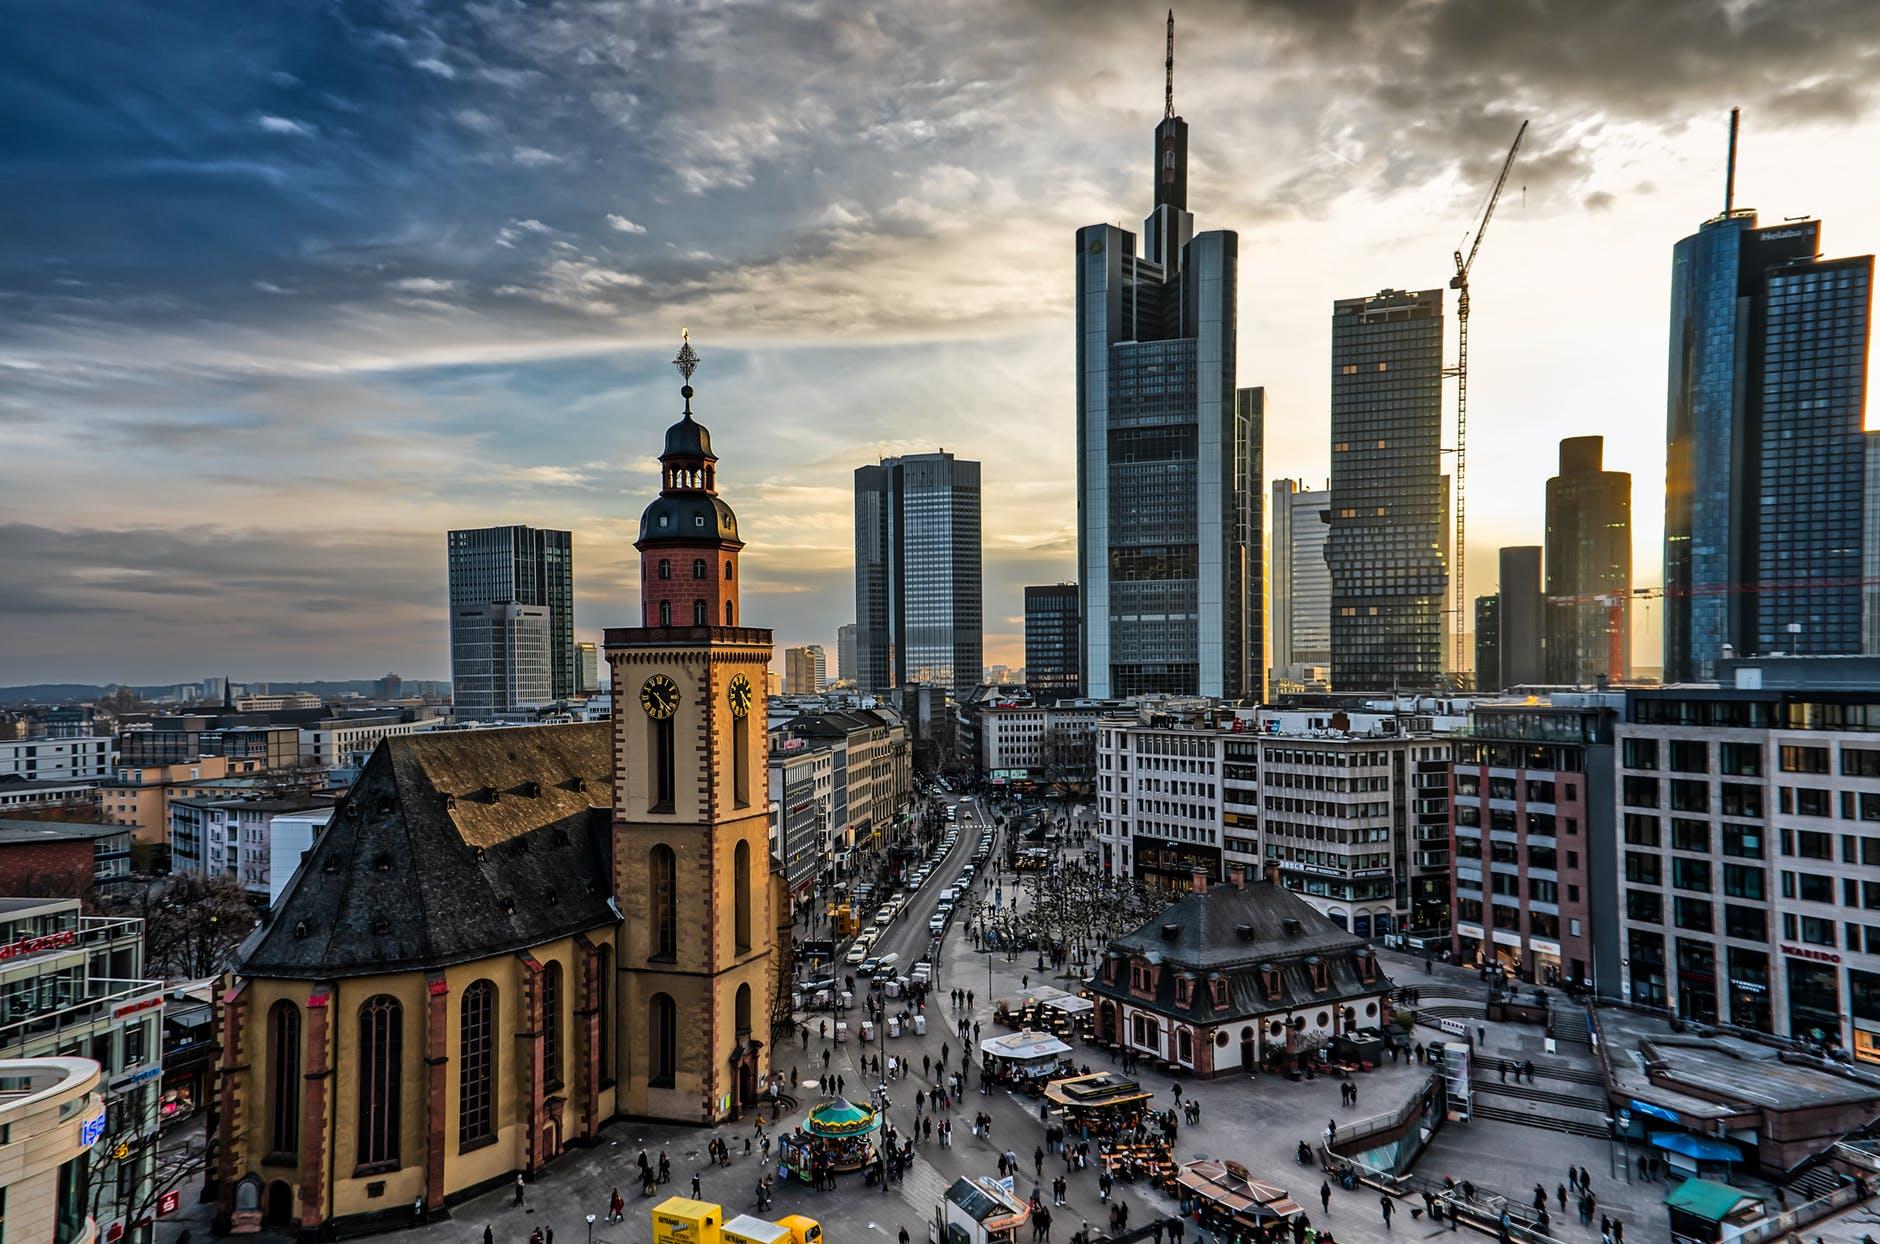 Büros in Frankfurt: Flächenengpass trotz Bauboom?